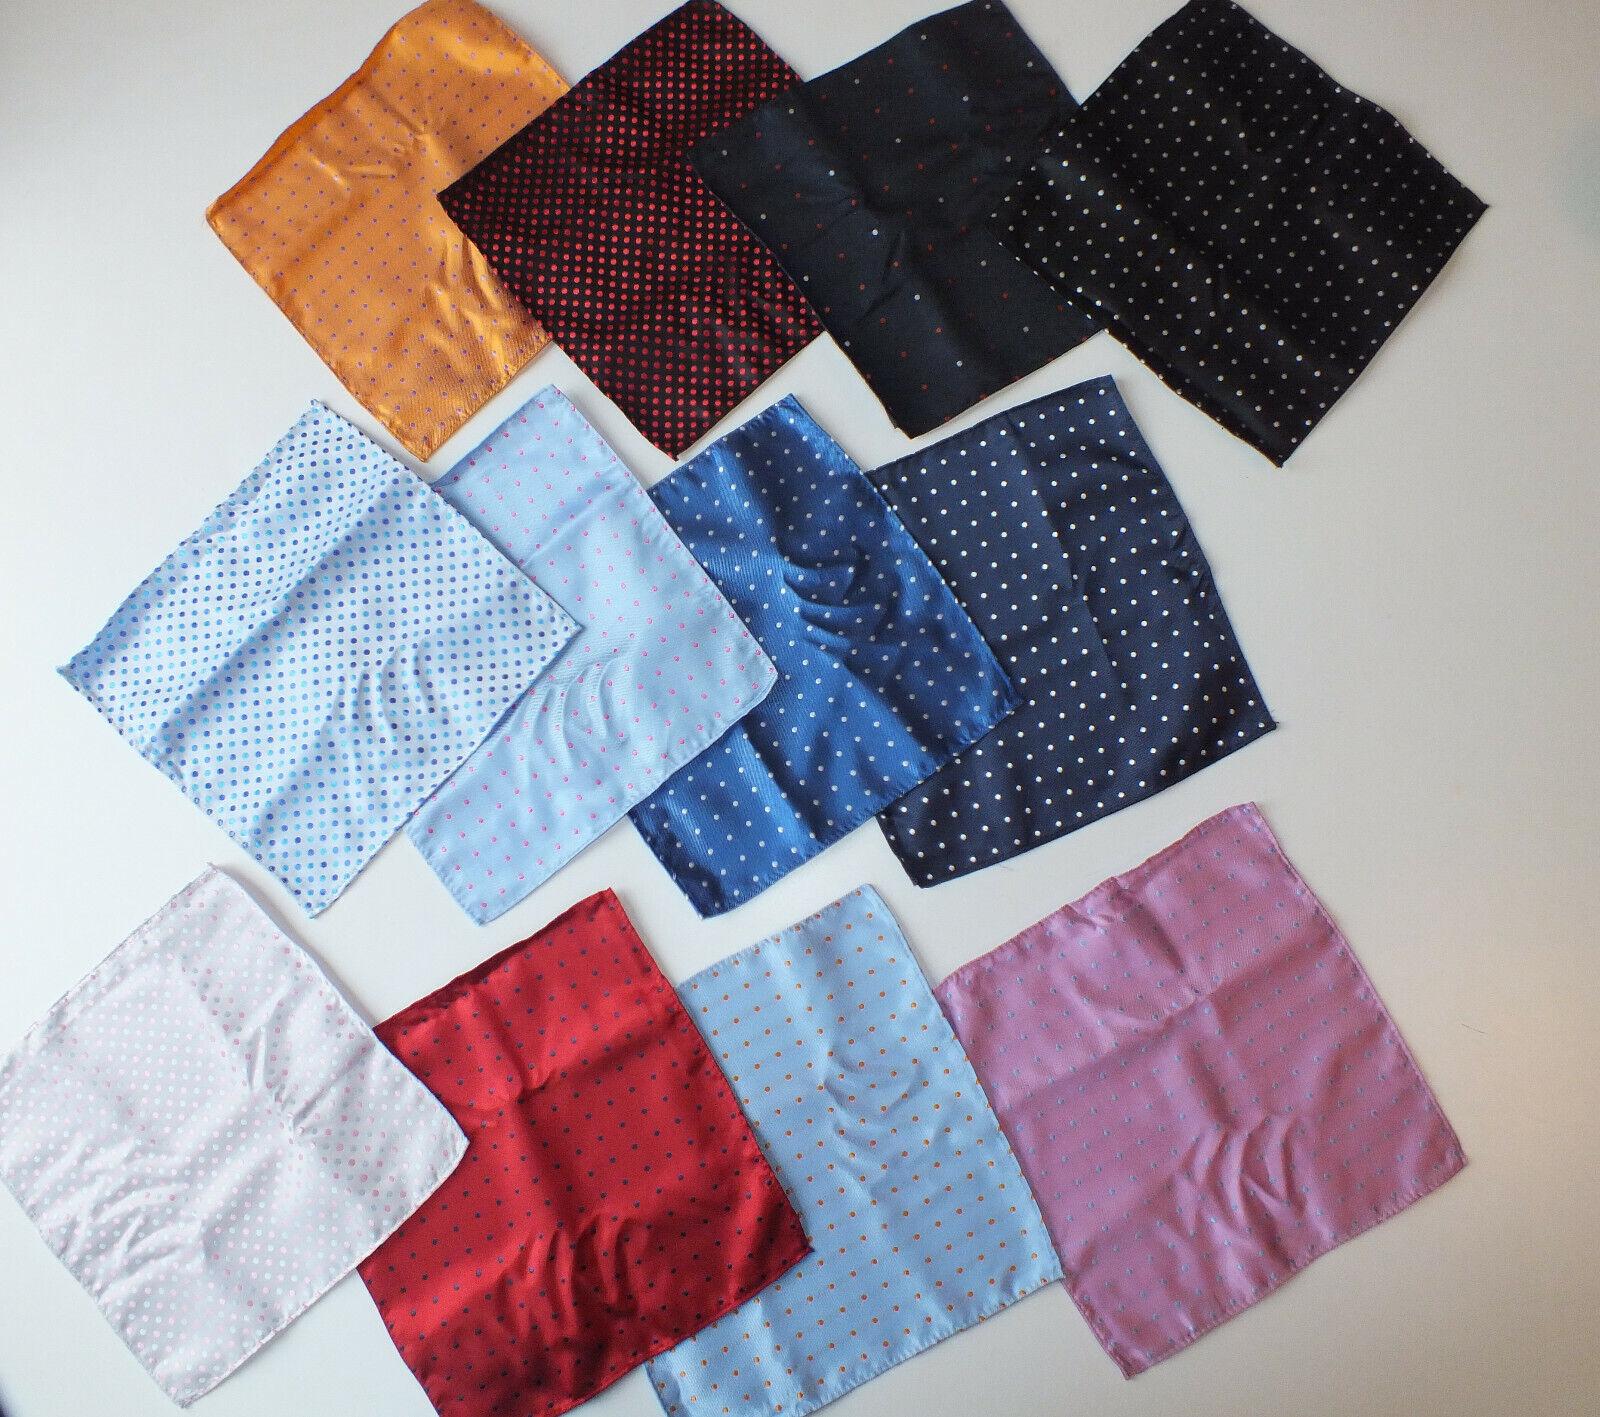 New 100% silk pocket square 25 cm pink blue white black polka dot 12 quantity